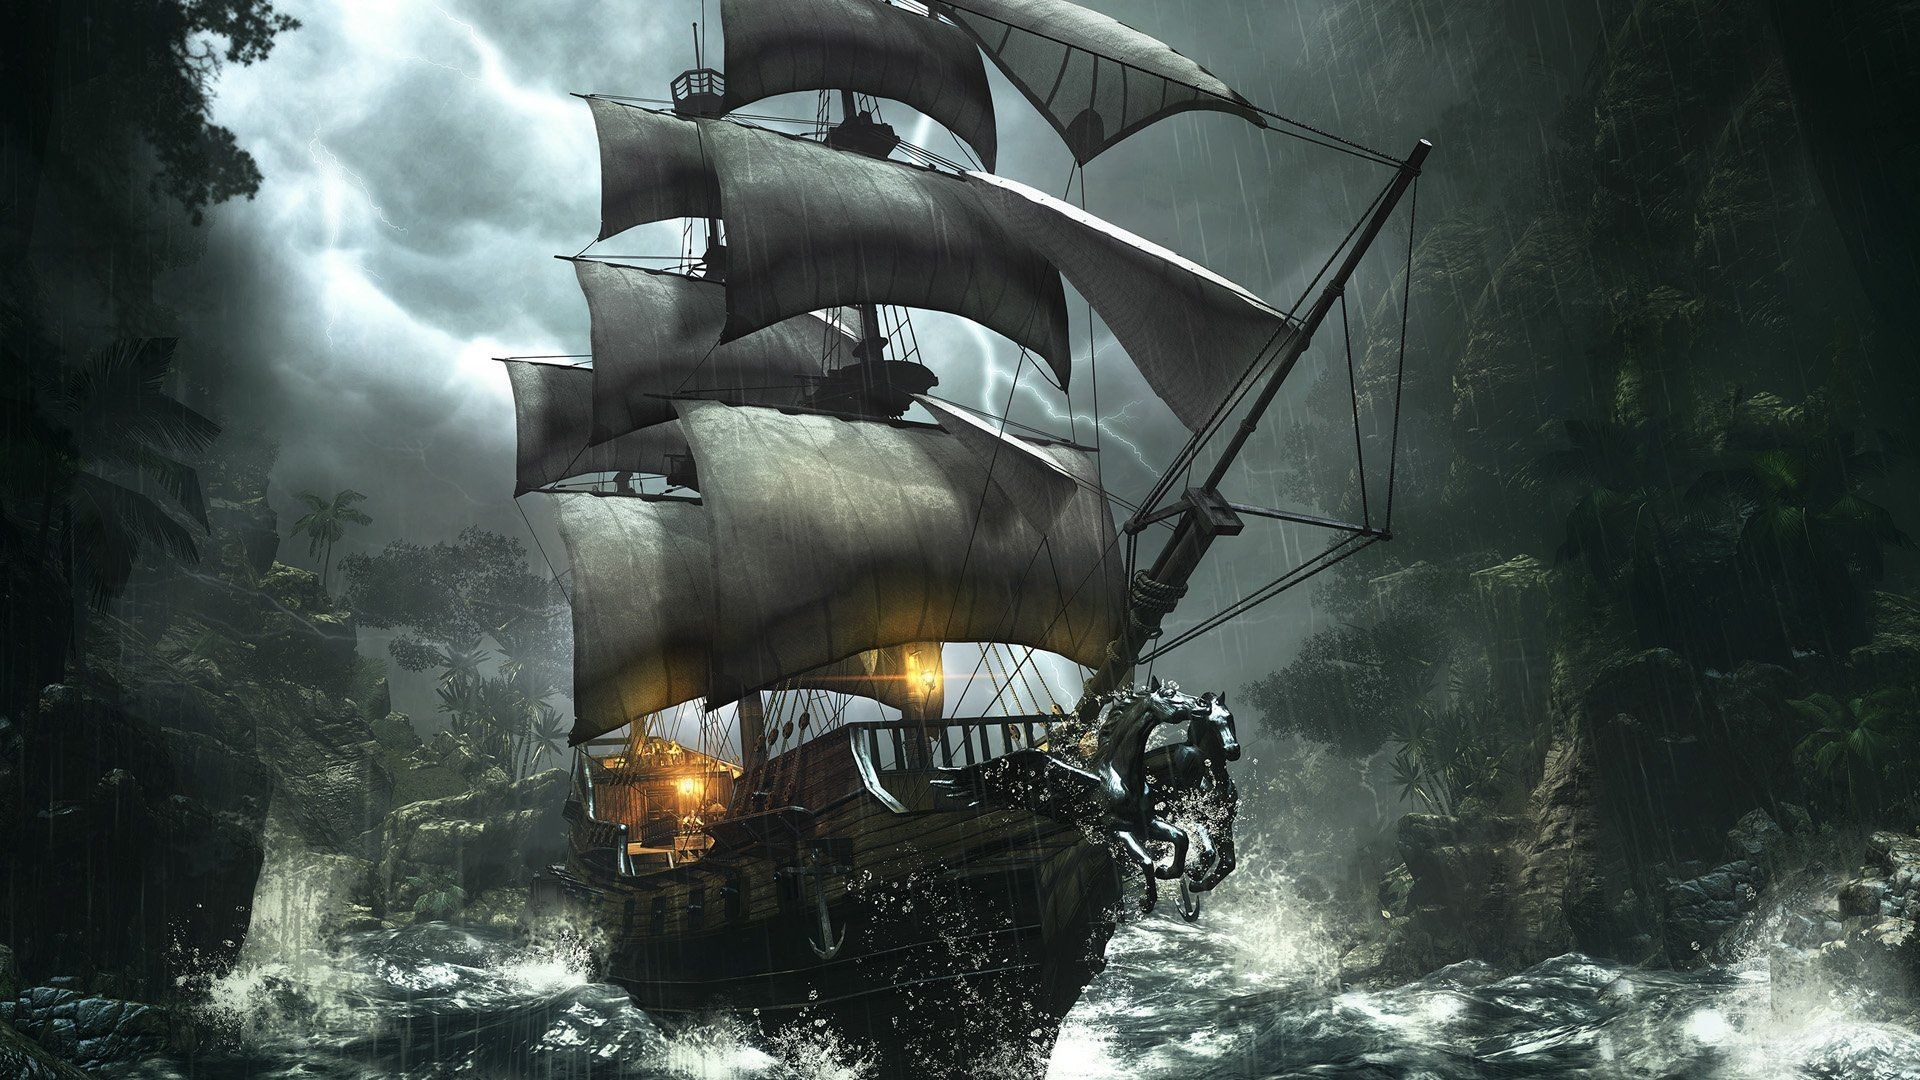 1920x1080 download download pirate ship wallpaper desktop 1dksc